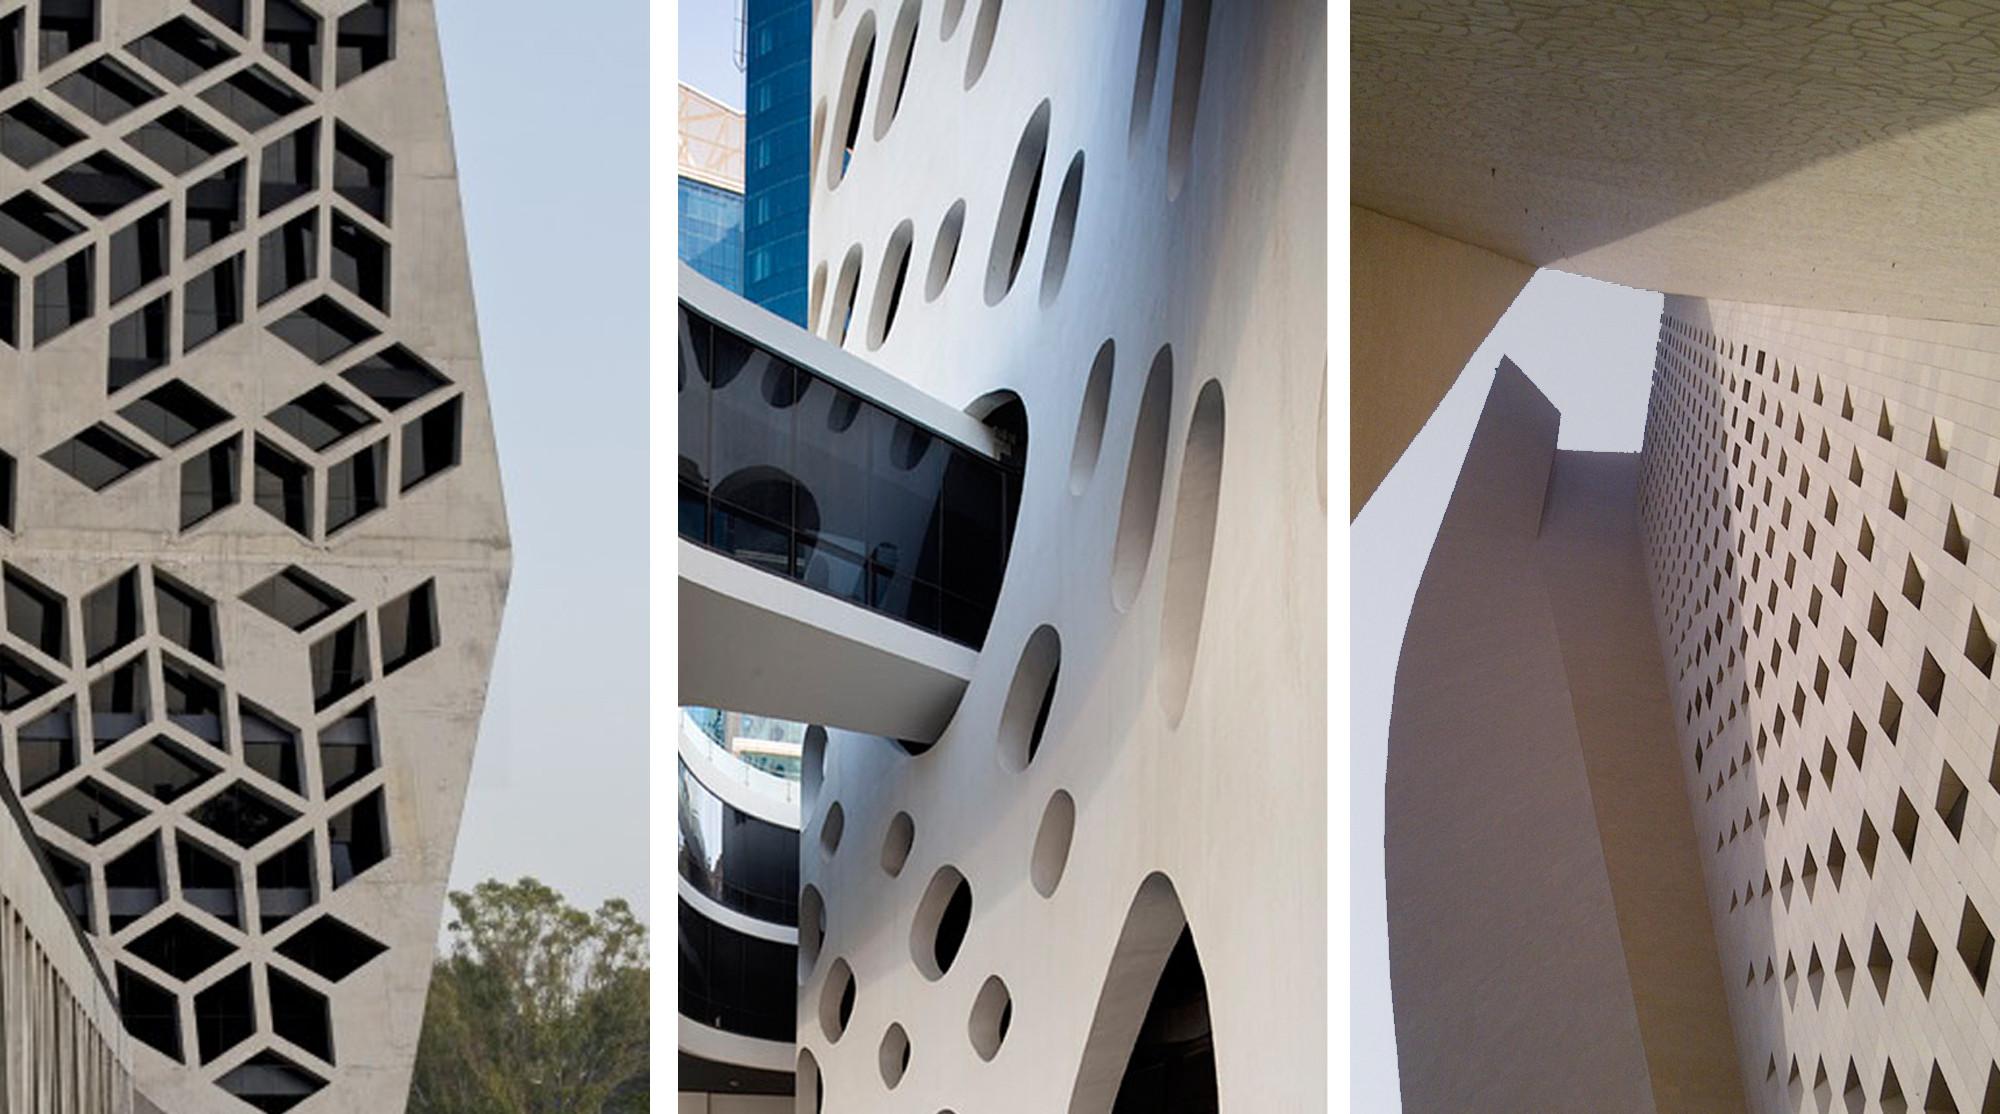 Edificios fachadas de hormig n perforado plataforma - Fachadas arquitectura ...